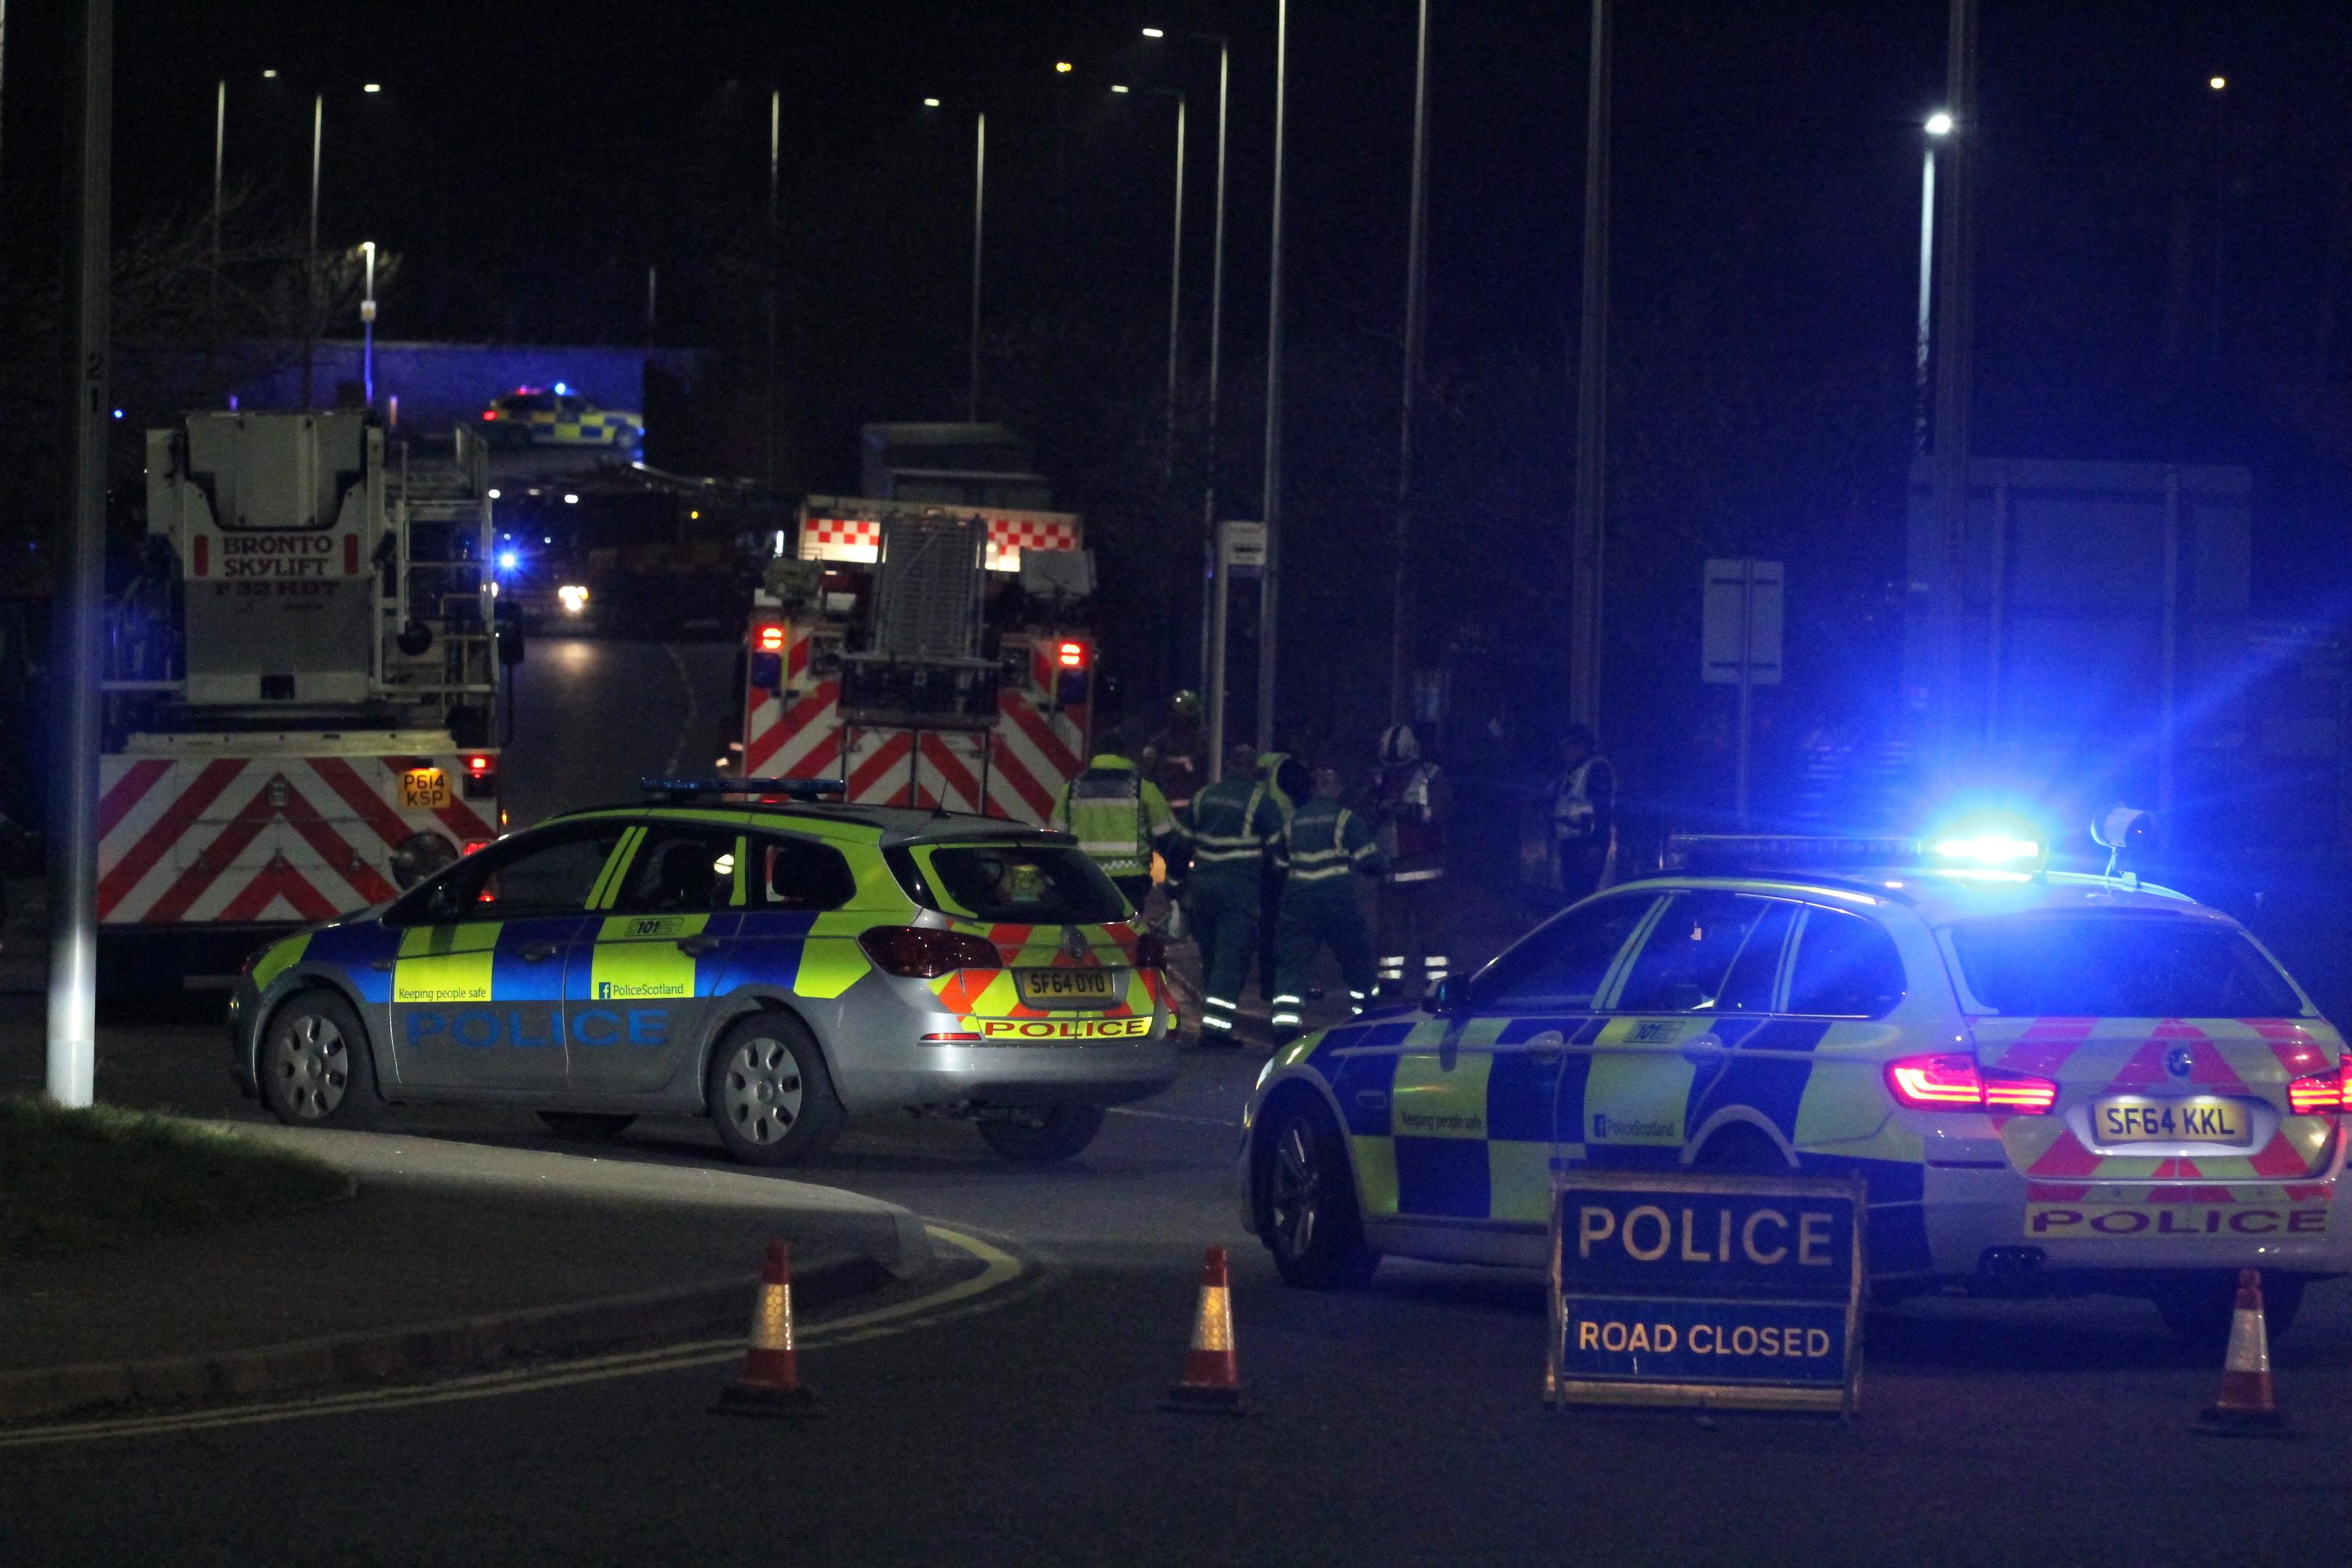 Emergency vehicles at the scene last night.